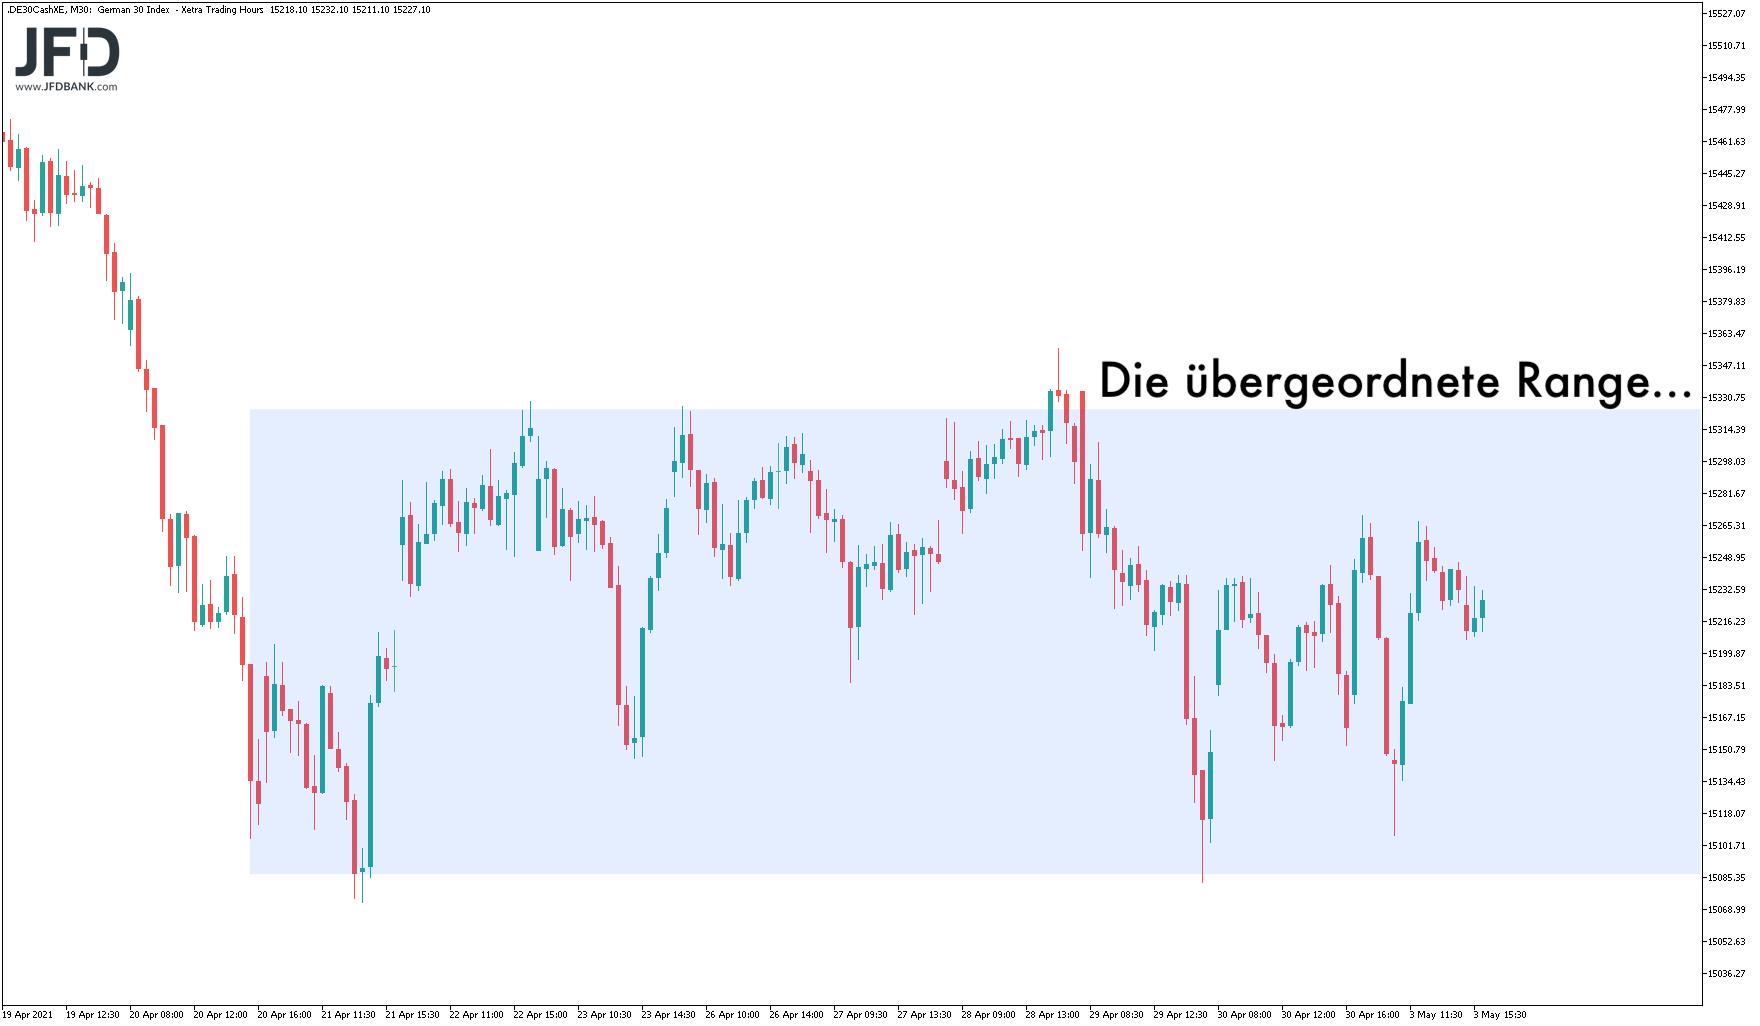 Volatiler-Mai-Start-wie-kann-es-weitergehen-Kommentar-JFD-Bank-GodmodeTrader.de-2